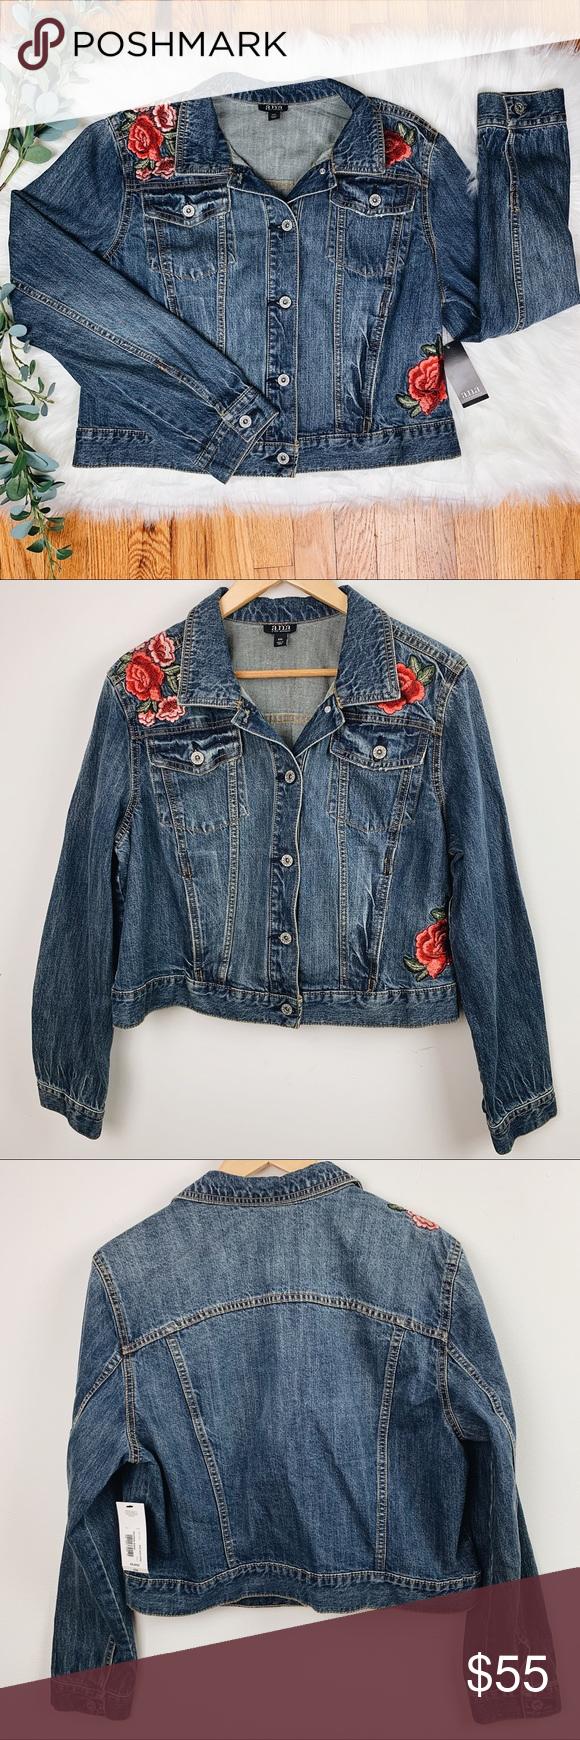 A N A Jean Jacket W Rose Embroidery Xxl Perfect Jeans Ana Jeans Fashion [ 1740 x 580 Pixel ]